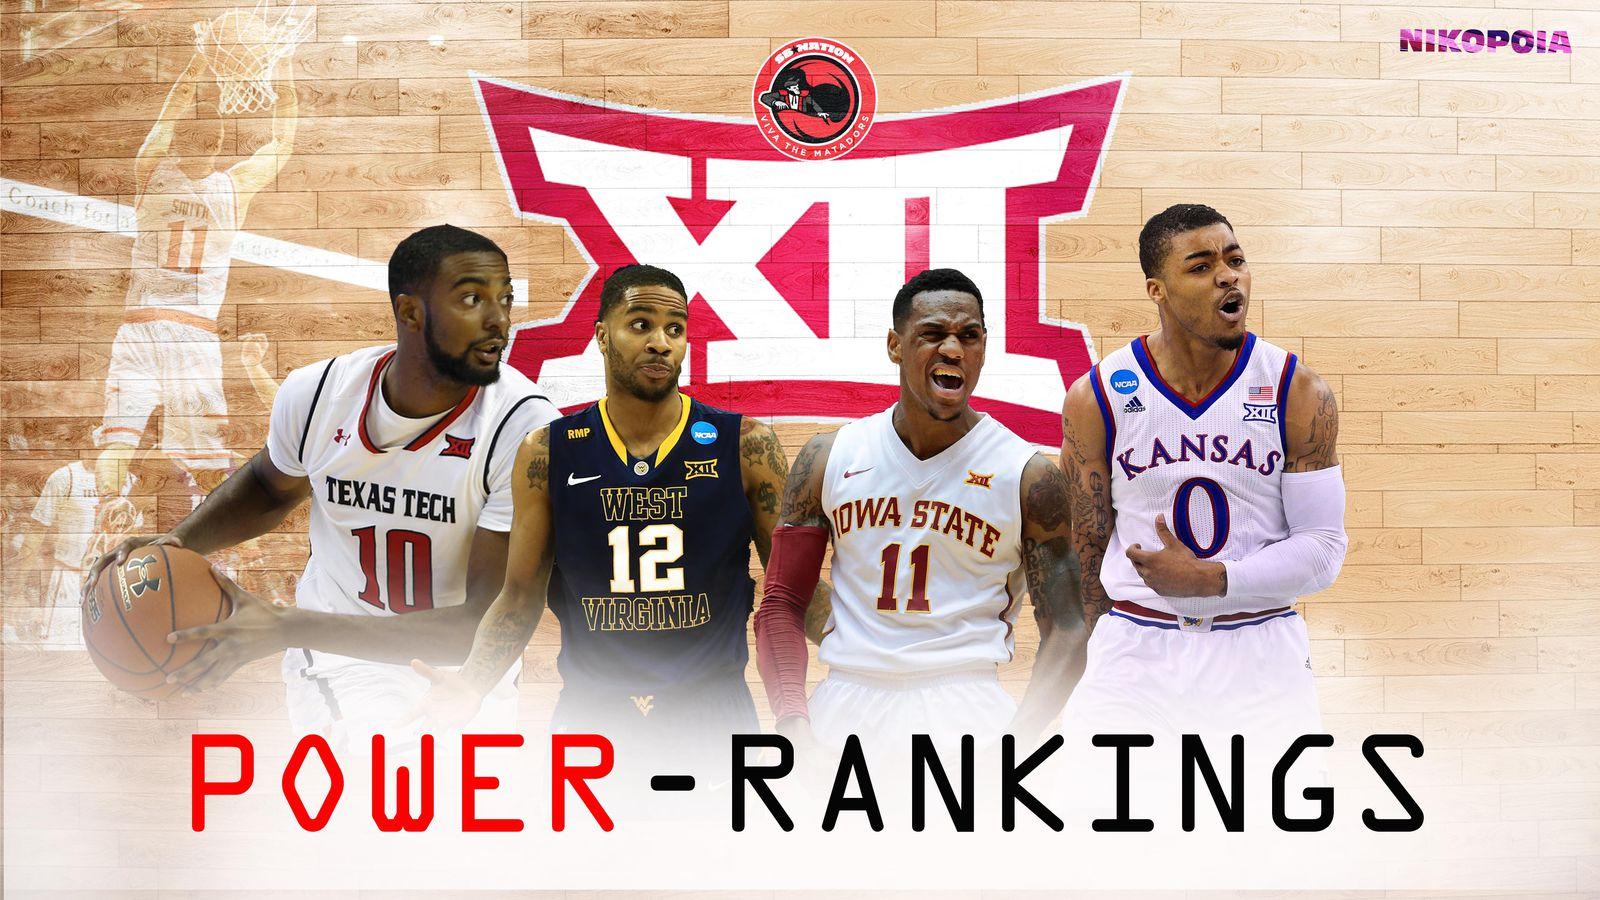 Basketball_power_rankings.0